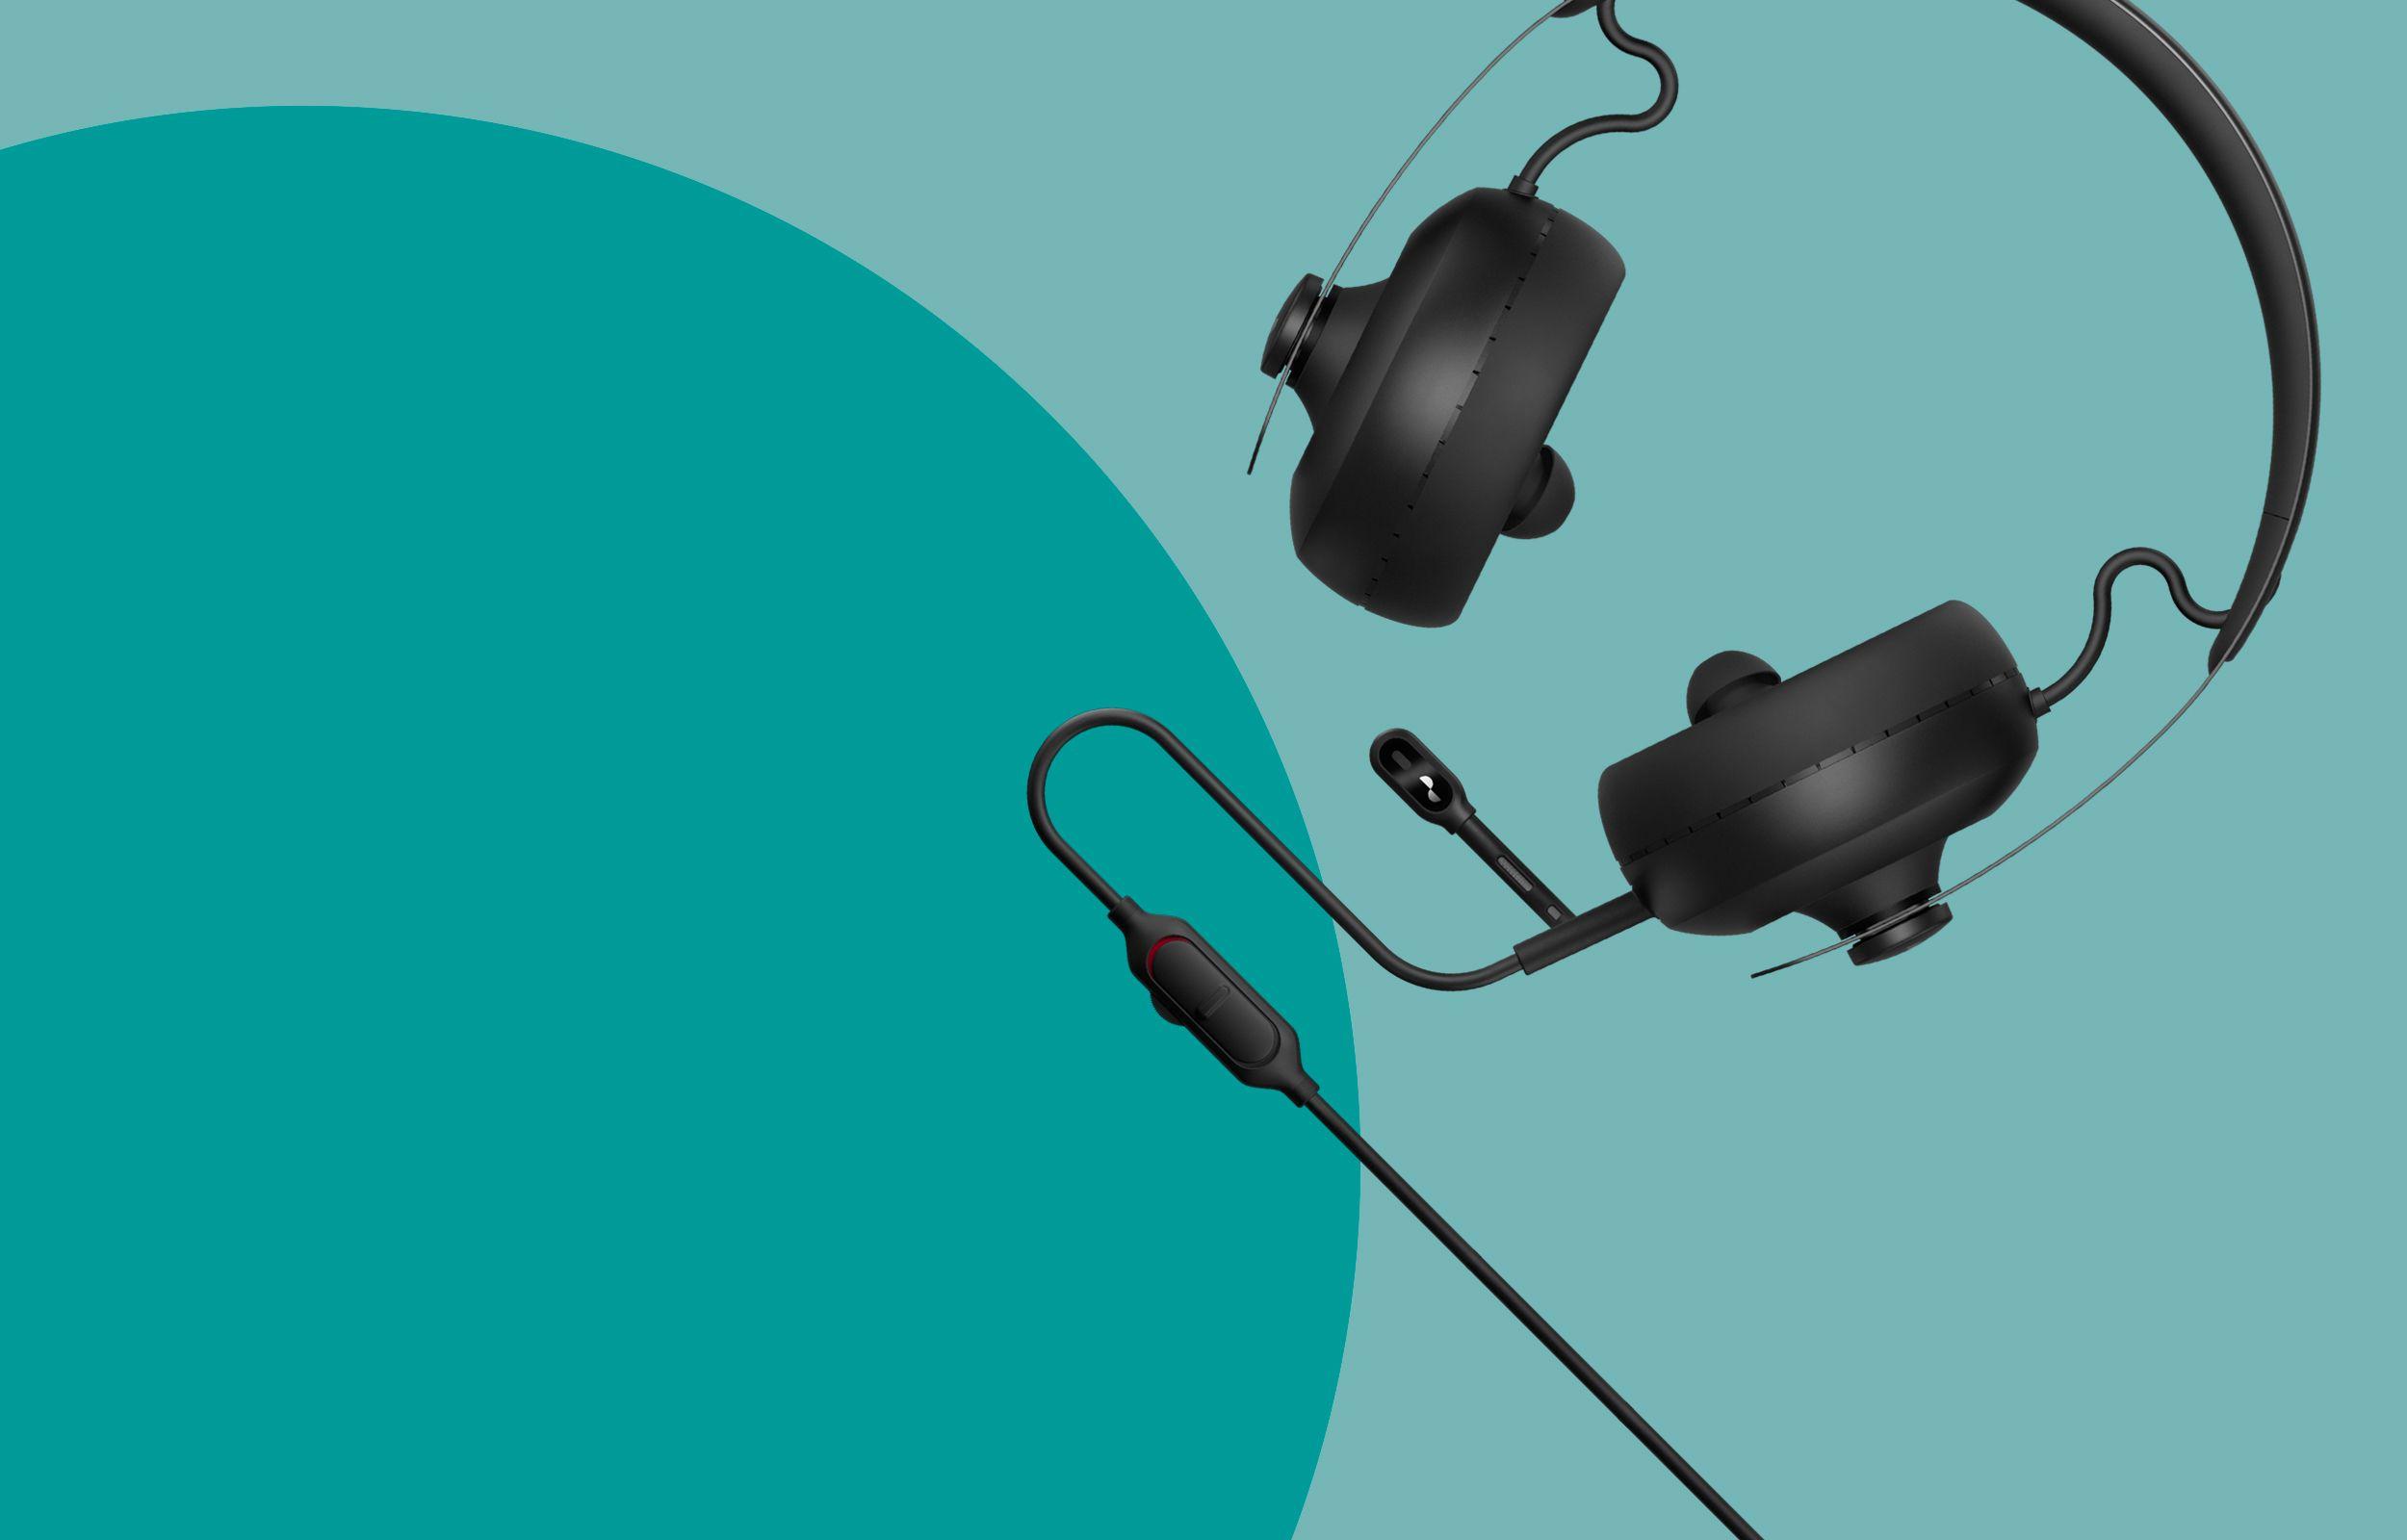 NURAPHONE headphone and NURAPHONE gaming microphone